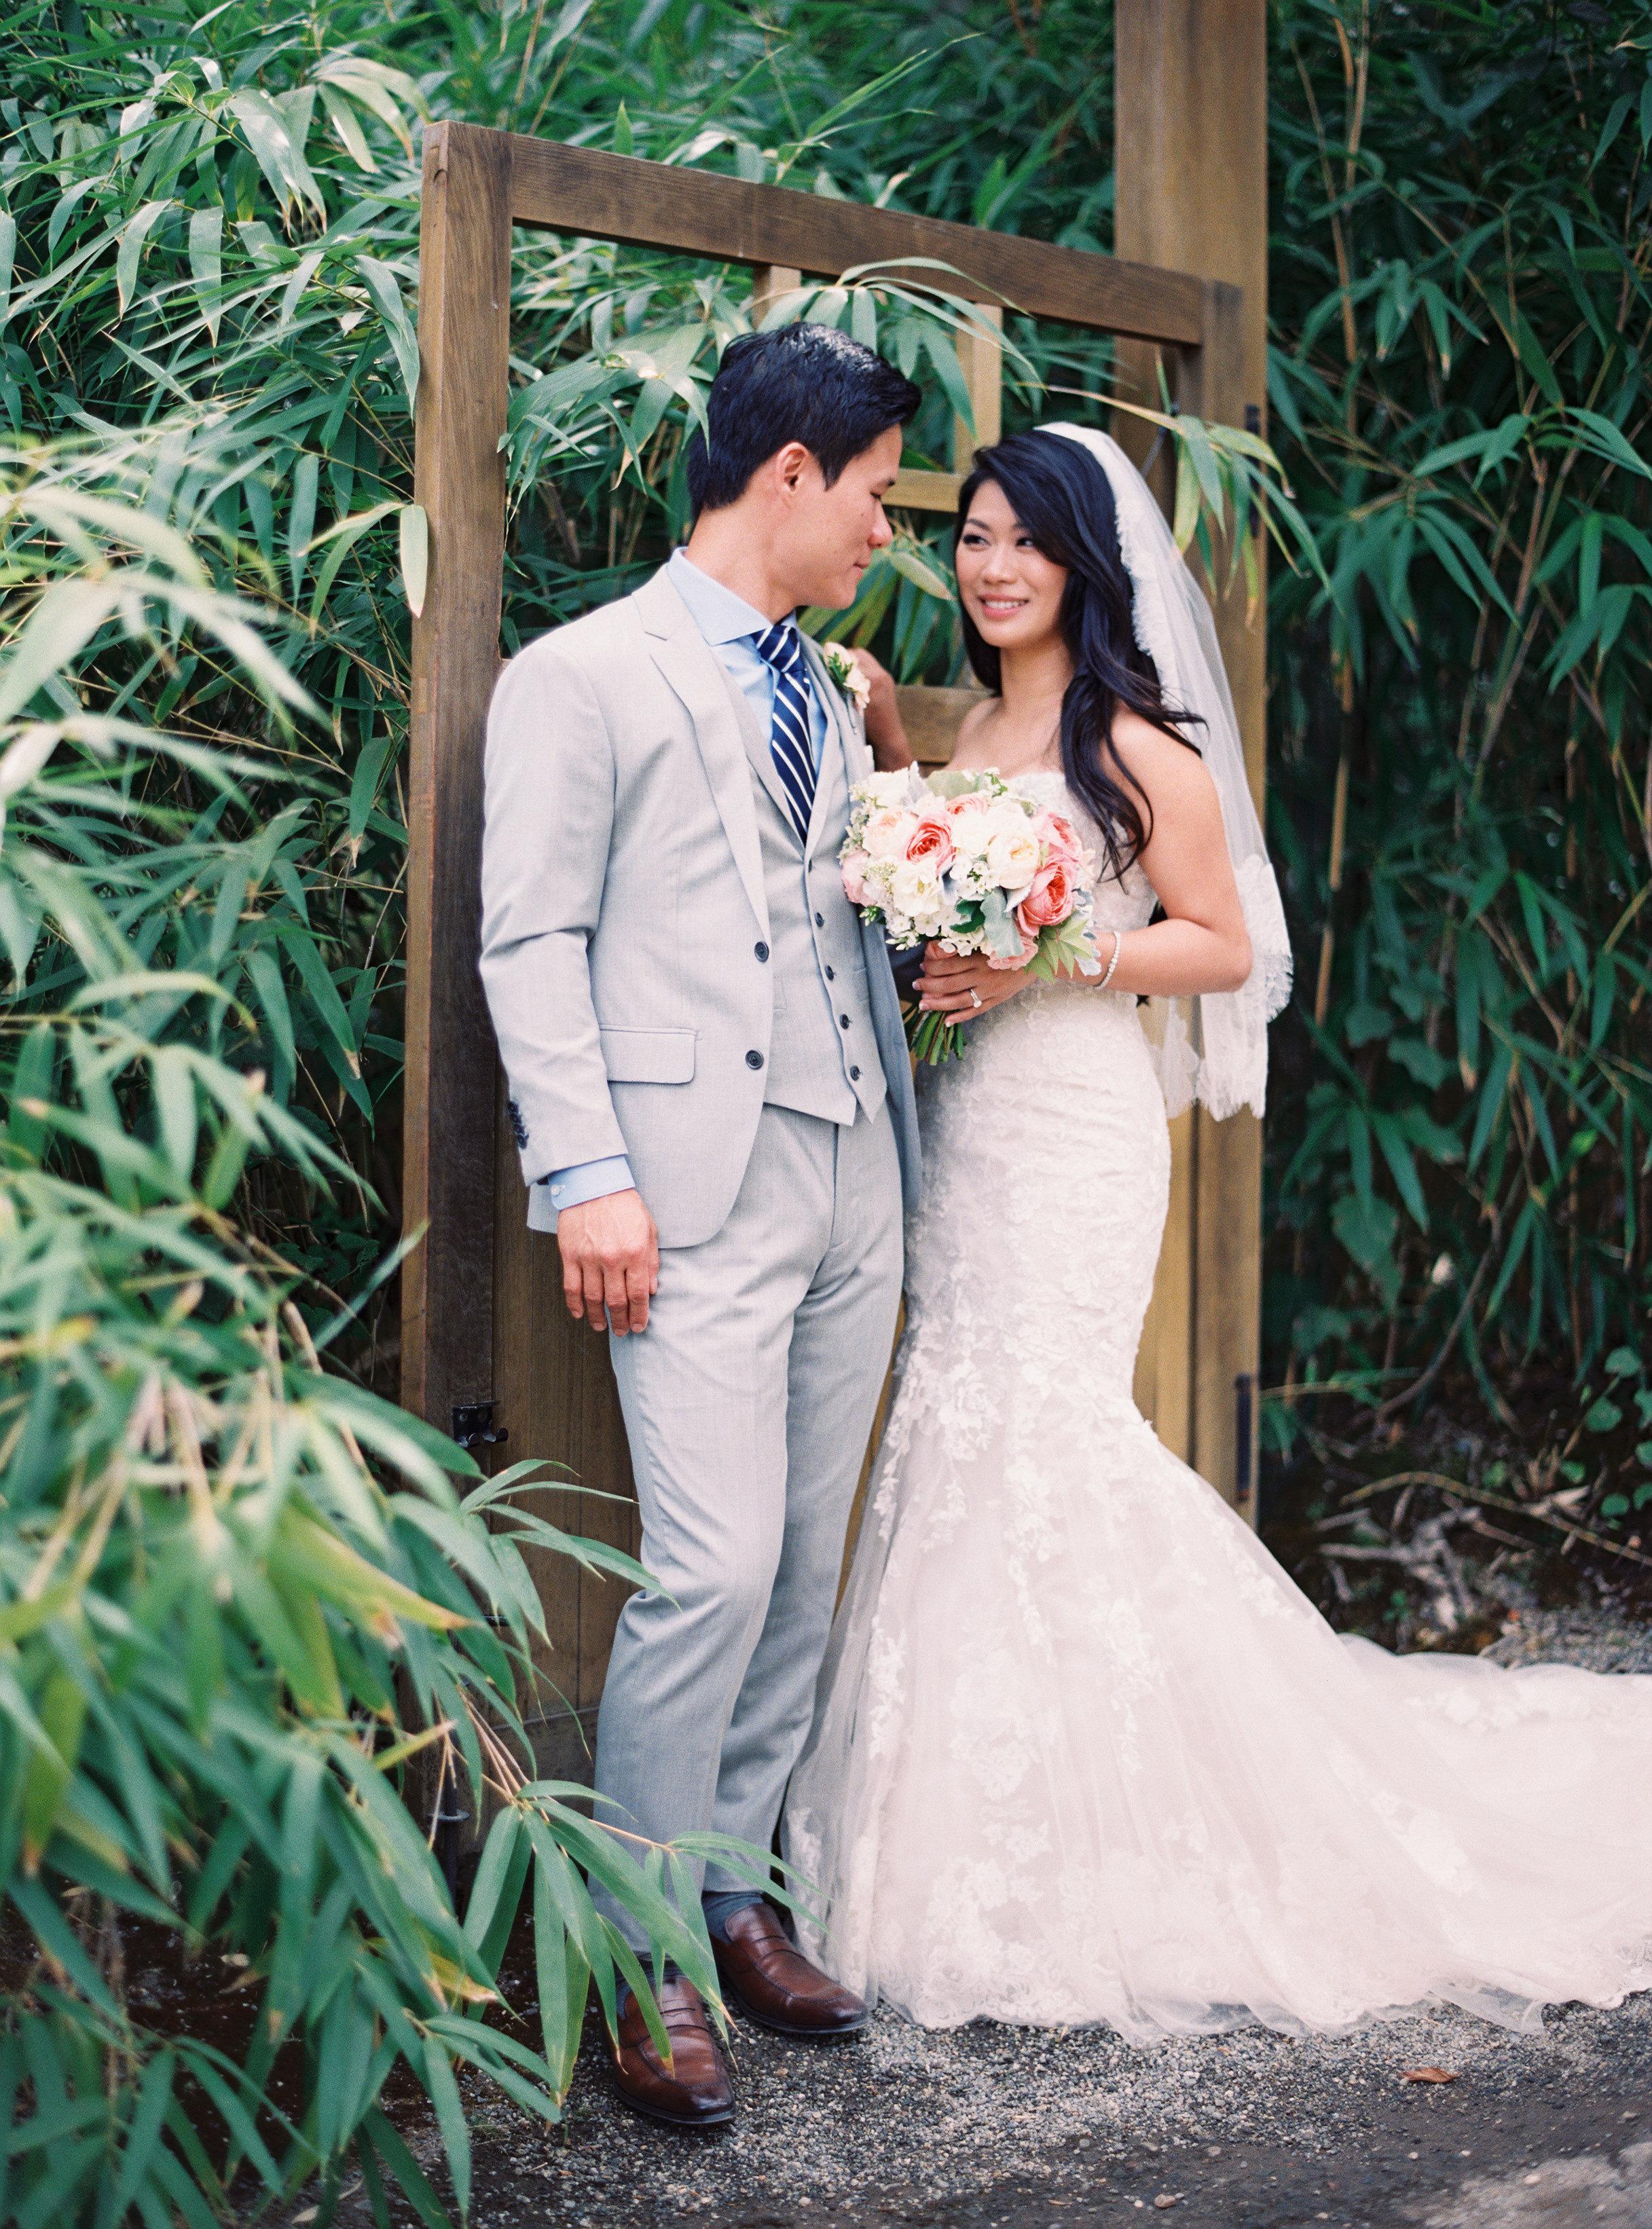 LindaTranPhotography-Flowerstory-Saratoga-wedding-bride-and-groom.jpg